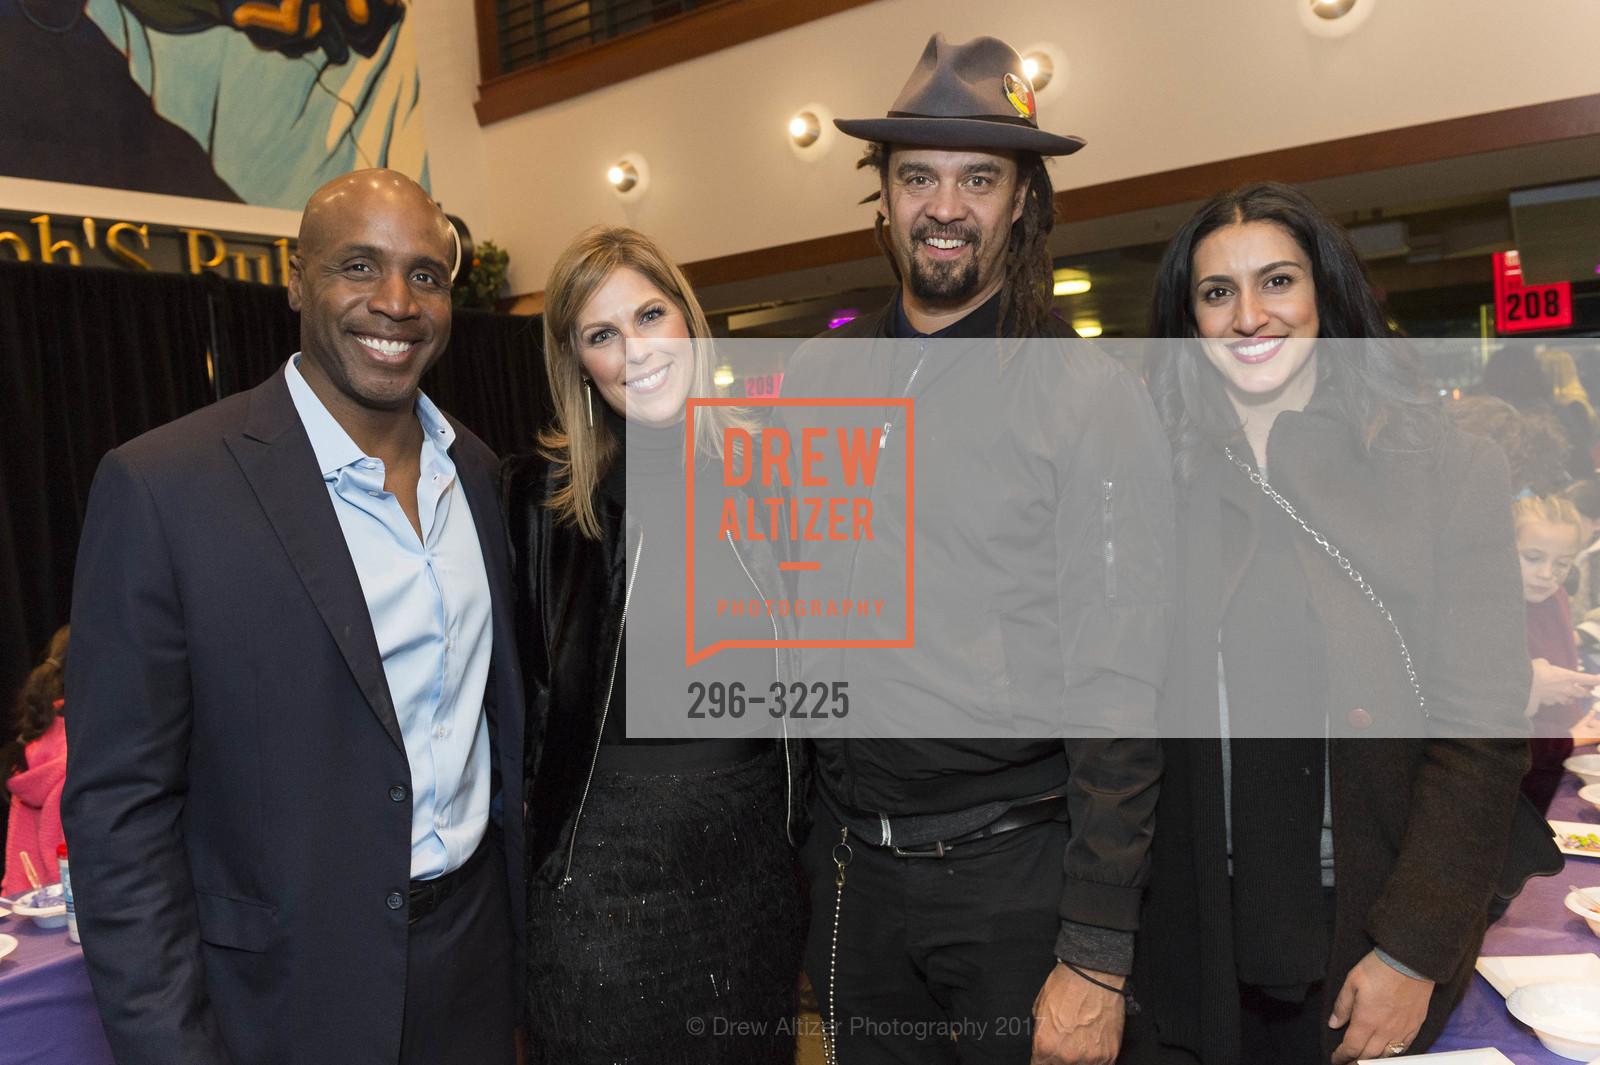 Barry Bond, Mendy Calegari, Michael Franti, Sara Agah Franti, Photo #296-3225